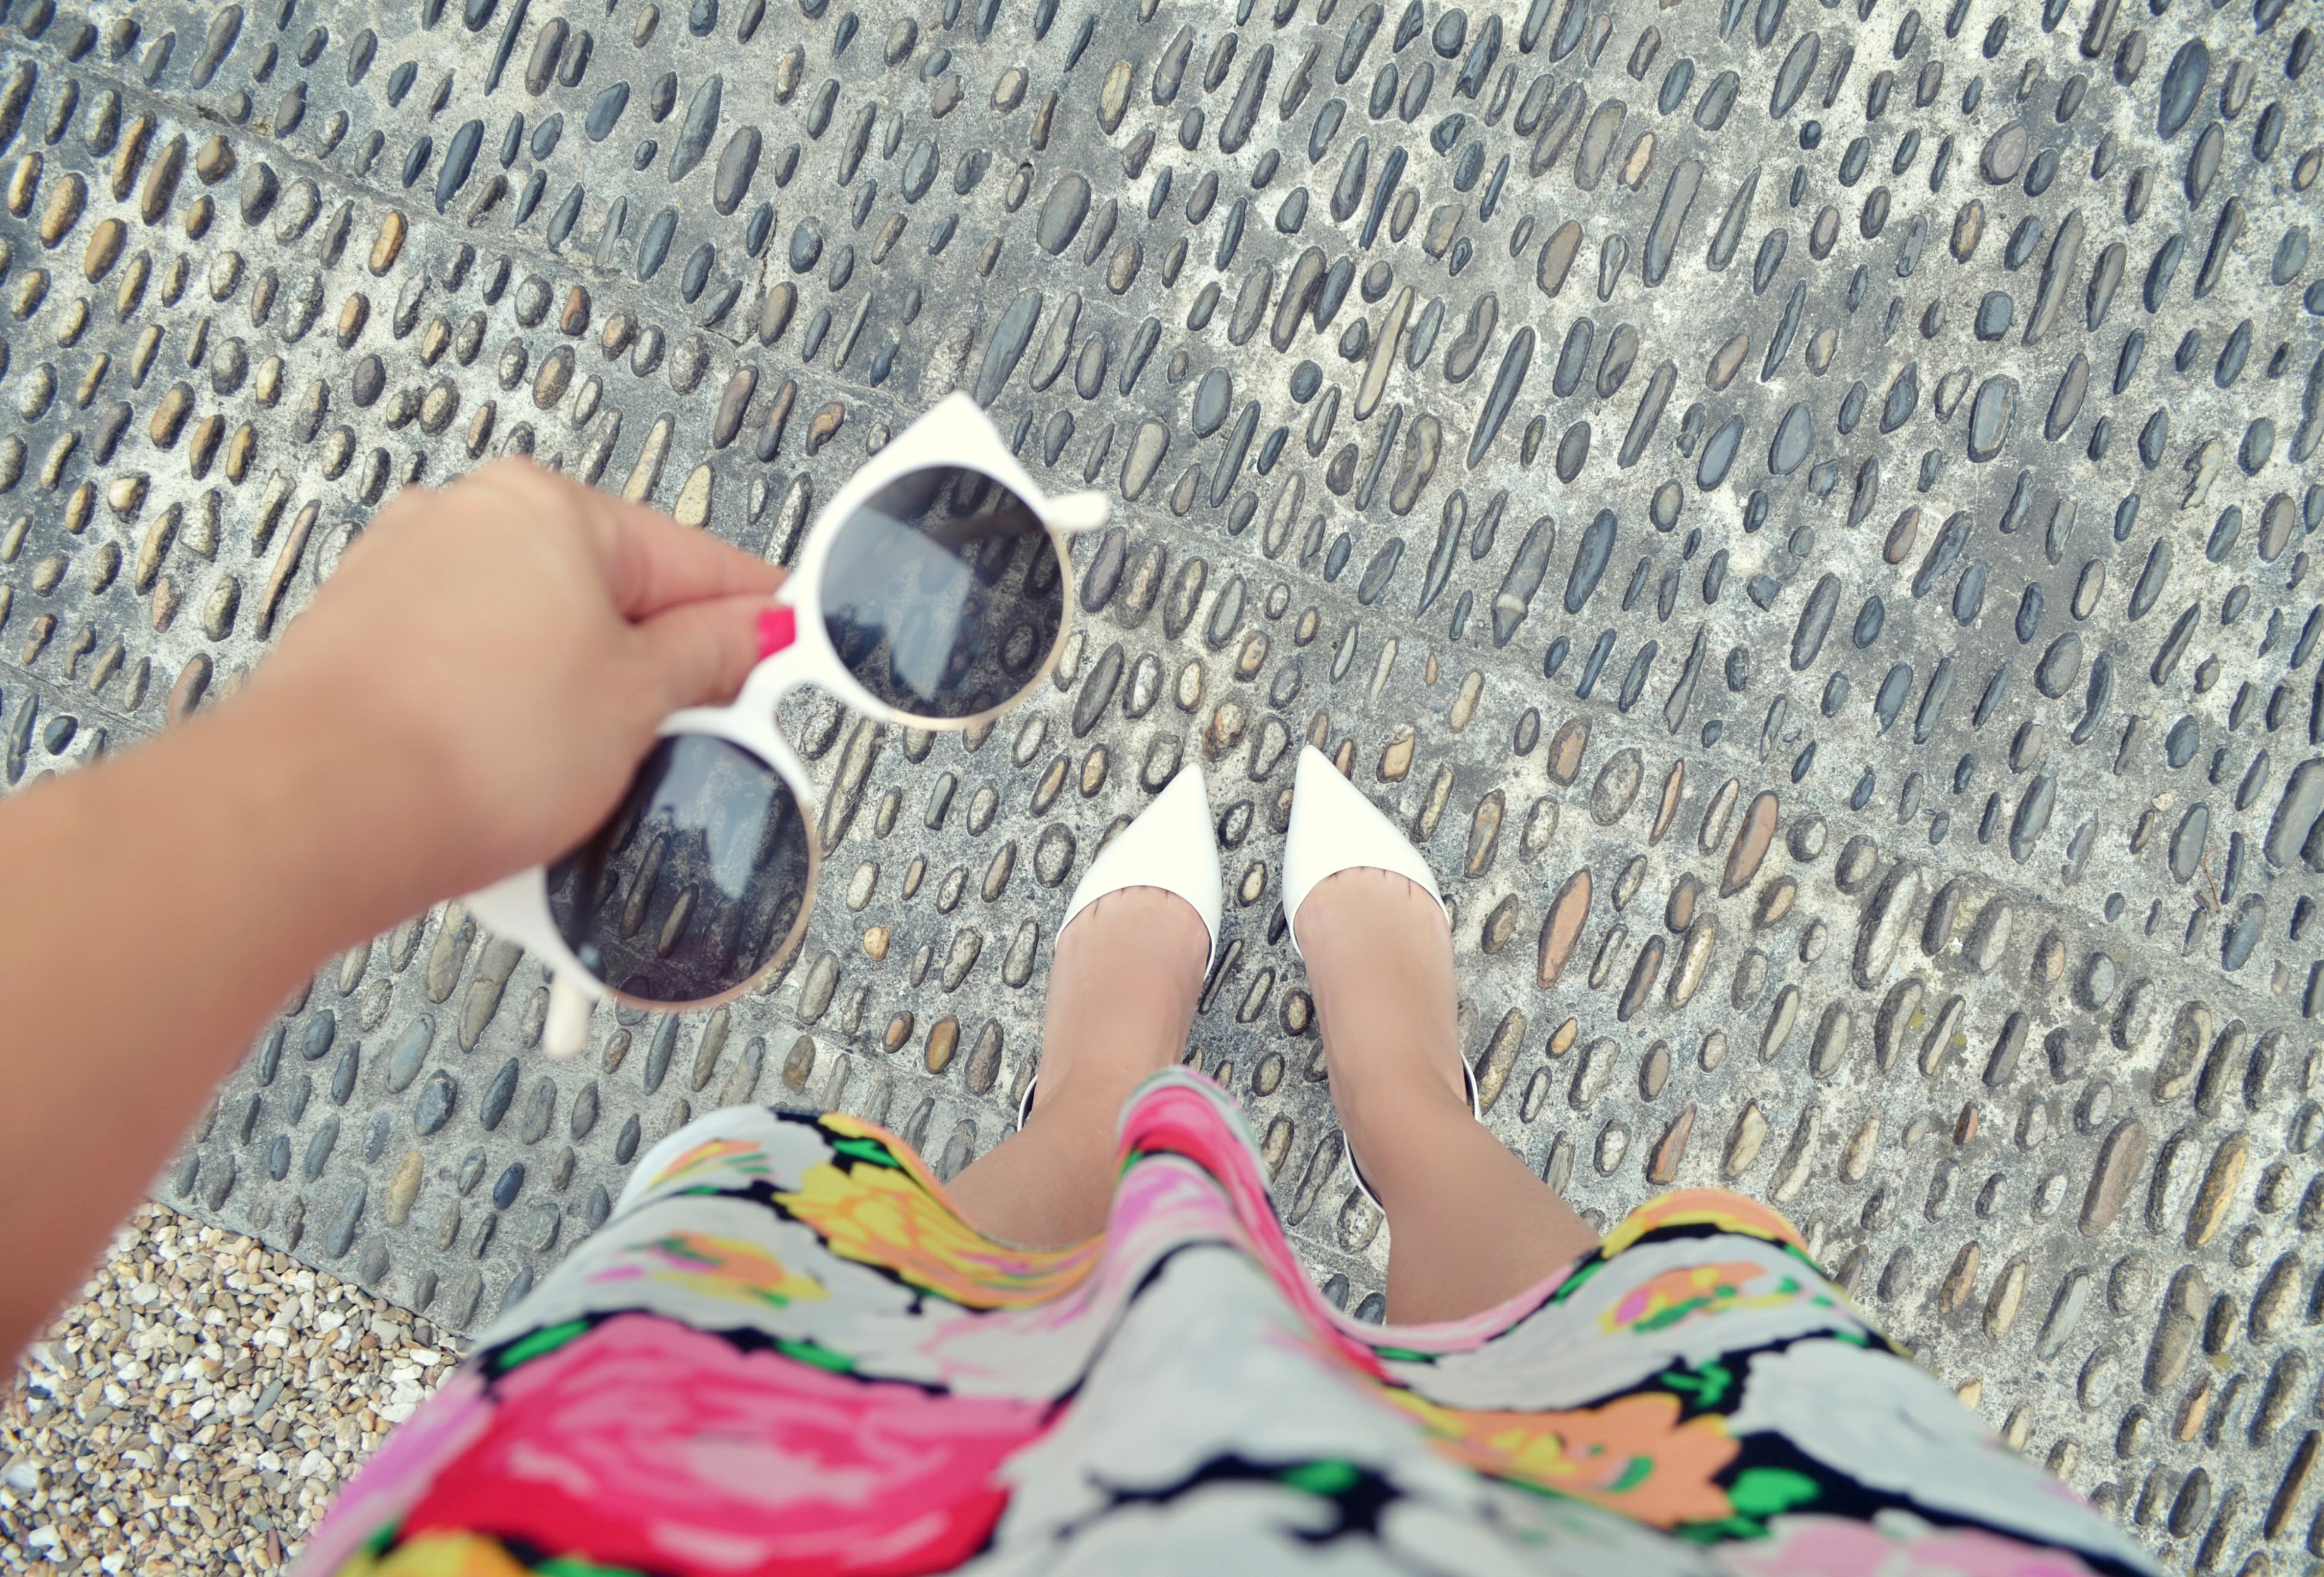 Zapatos-blancos-blog-de-moda-ChicAdicta-fashionista-Chic-Adicta-fashion-travel-vestido-de-flores-white-sunglasses-PiensaenChic-Piensa-en-Chic